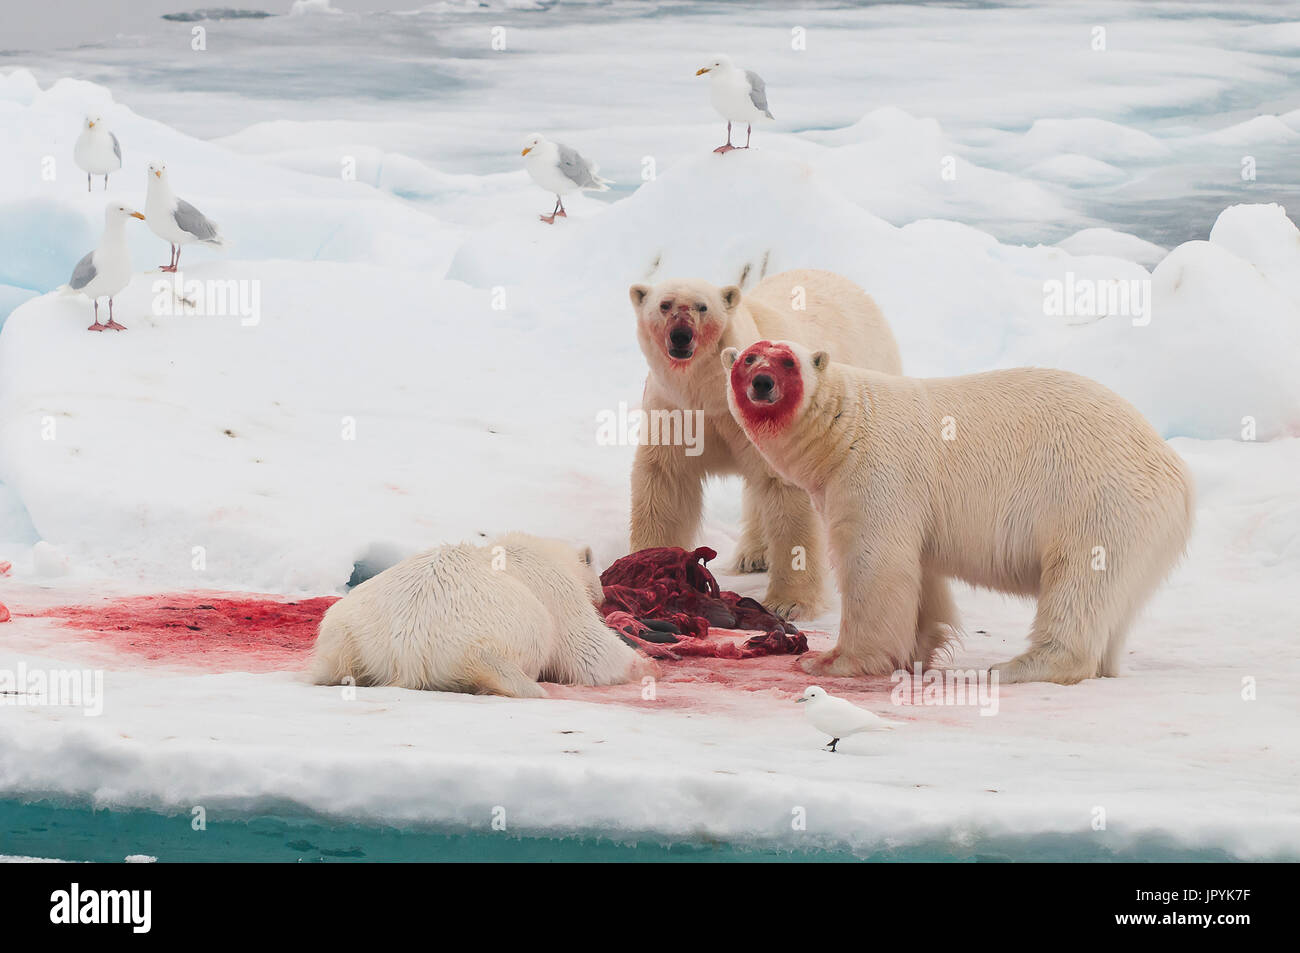 Polar bear eating a bearded seal - Spitsbergen - Stock Image